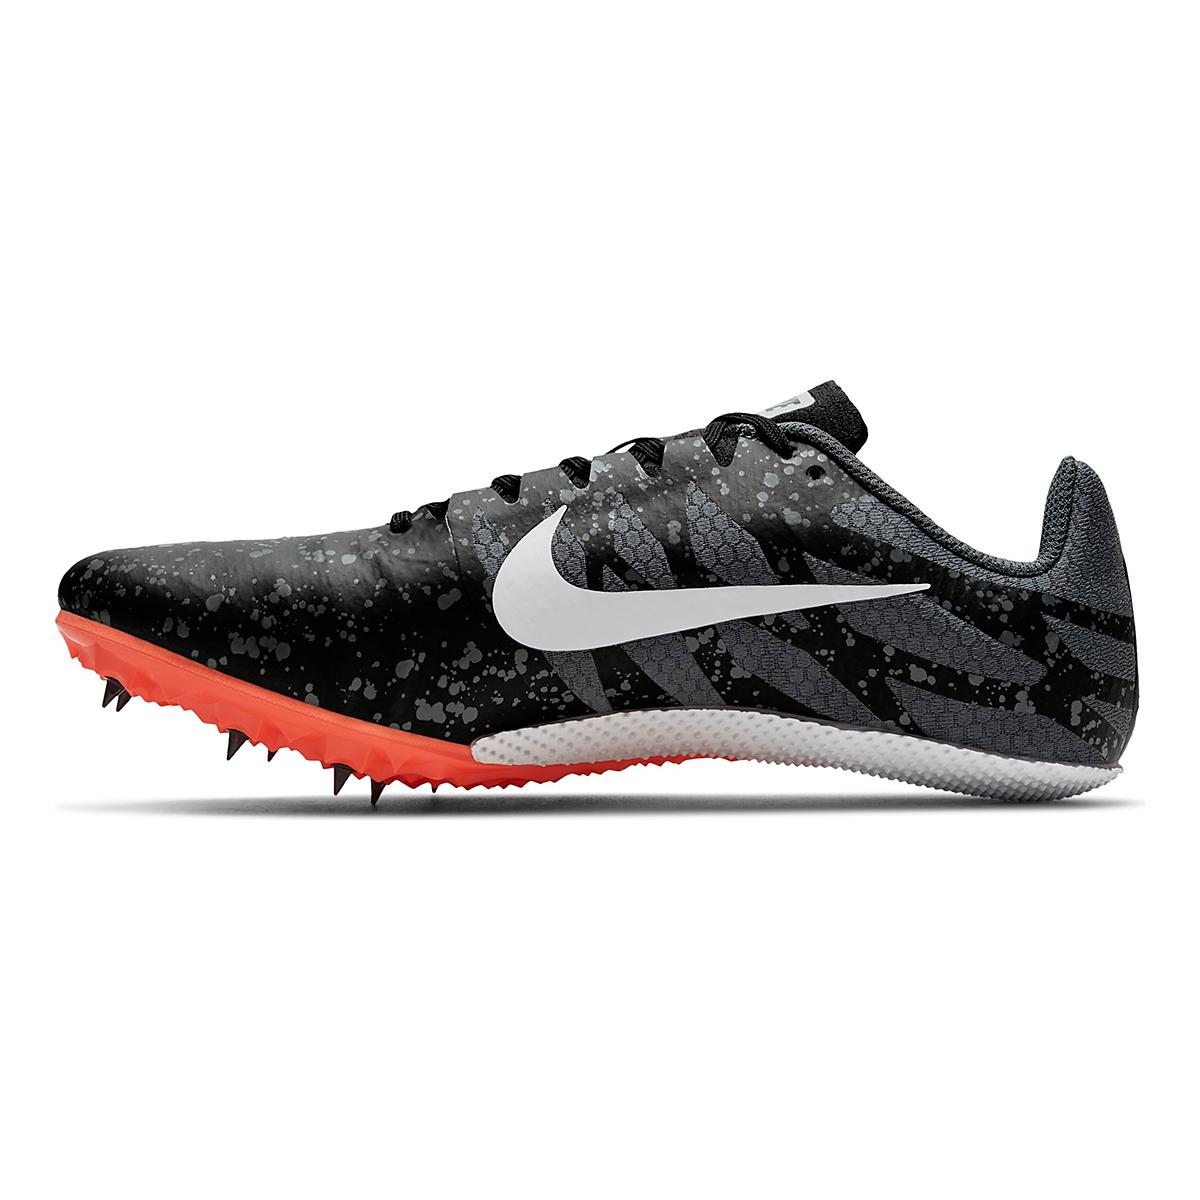 Men's Nike Zoom Rival S 9 Track Spikes - Color: Black/White/Orange - Size: 4 - Width: Regular, Black/White/Orange, large, image 2